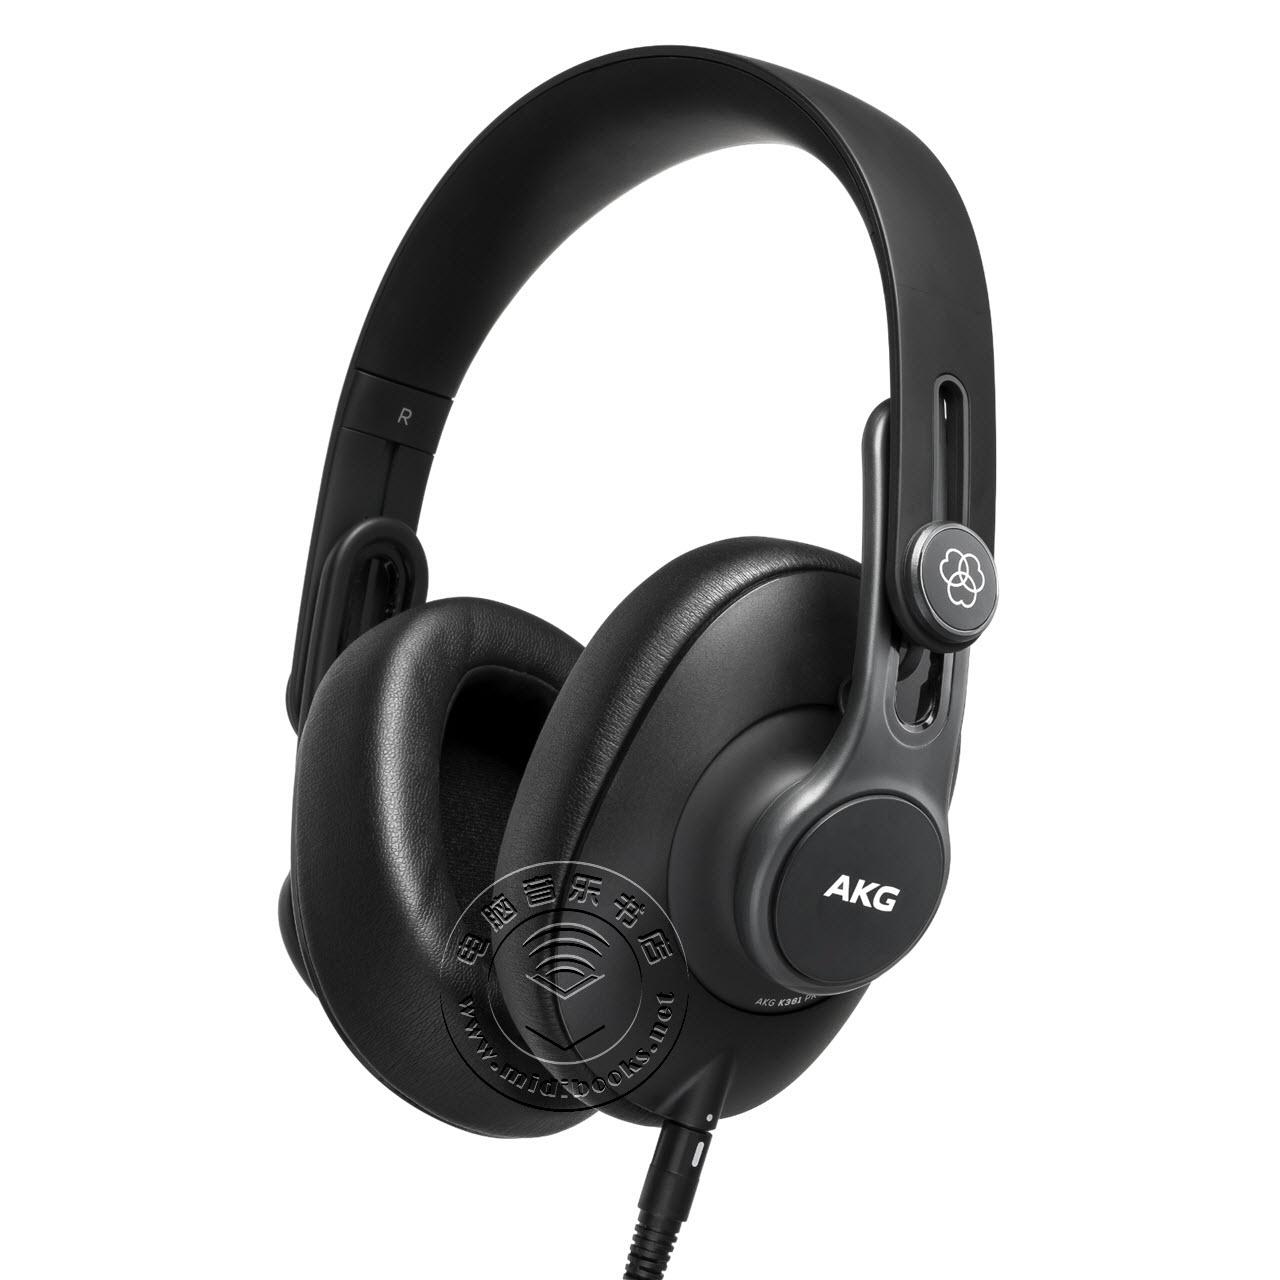 AKG 发布 K361 和 K371 工作室级专业监听耳机